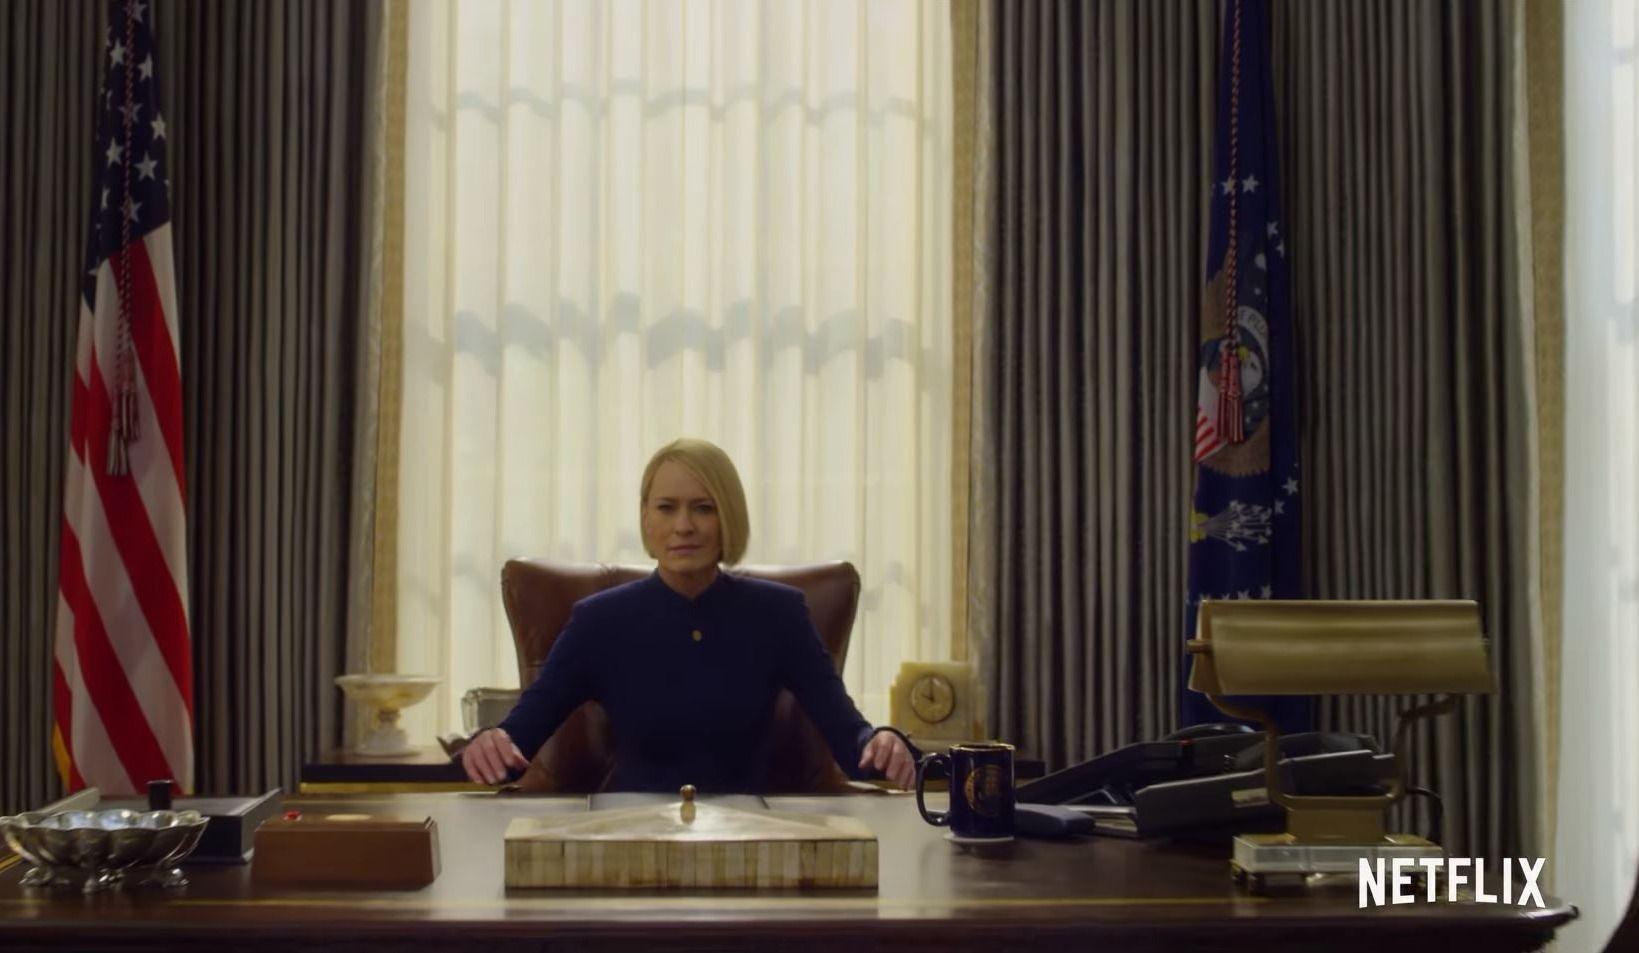 Netflix Teases House of Cards Final Season